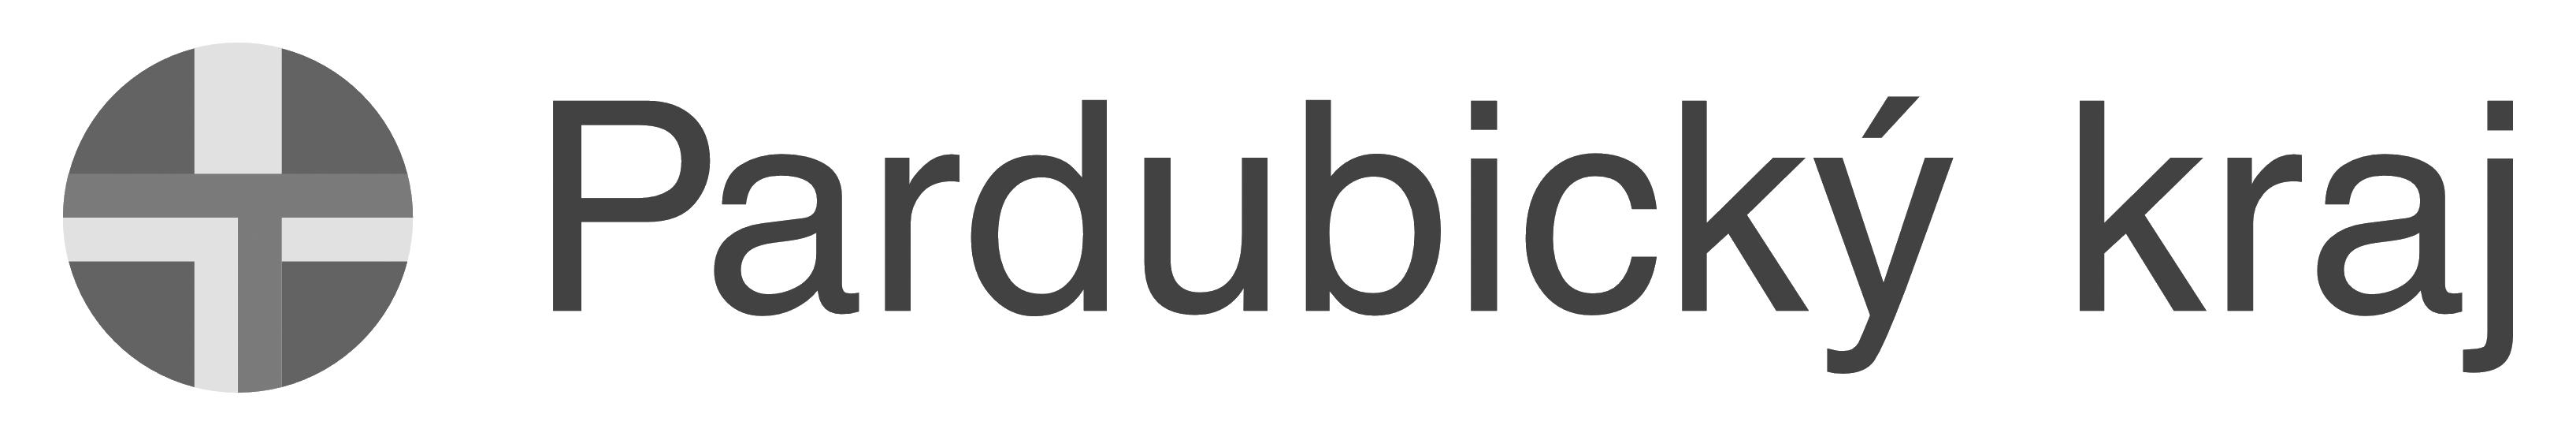 pardbubicky_kraj_logo.png